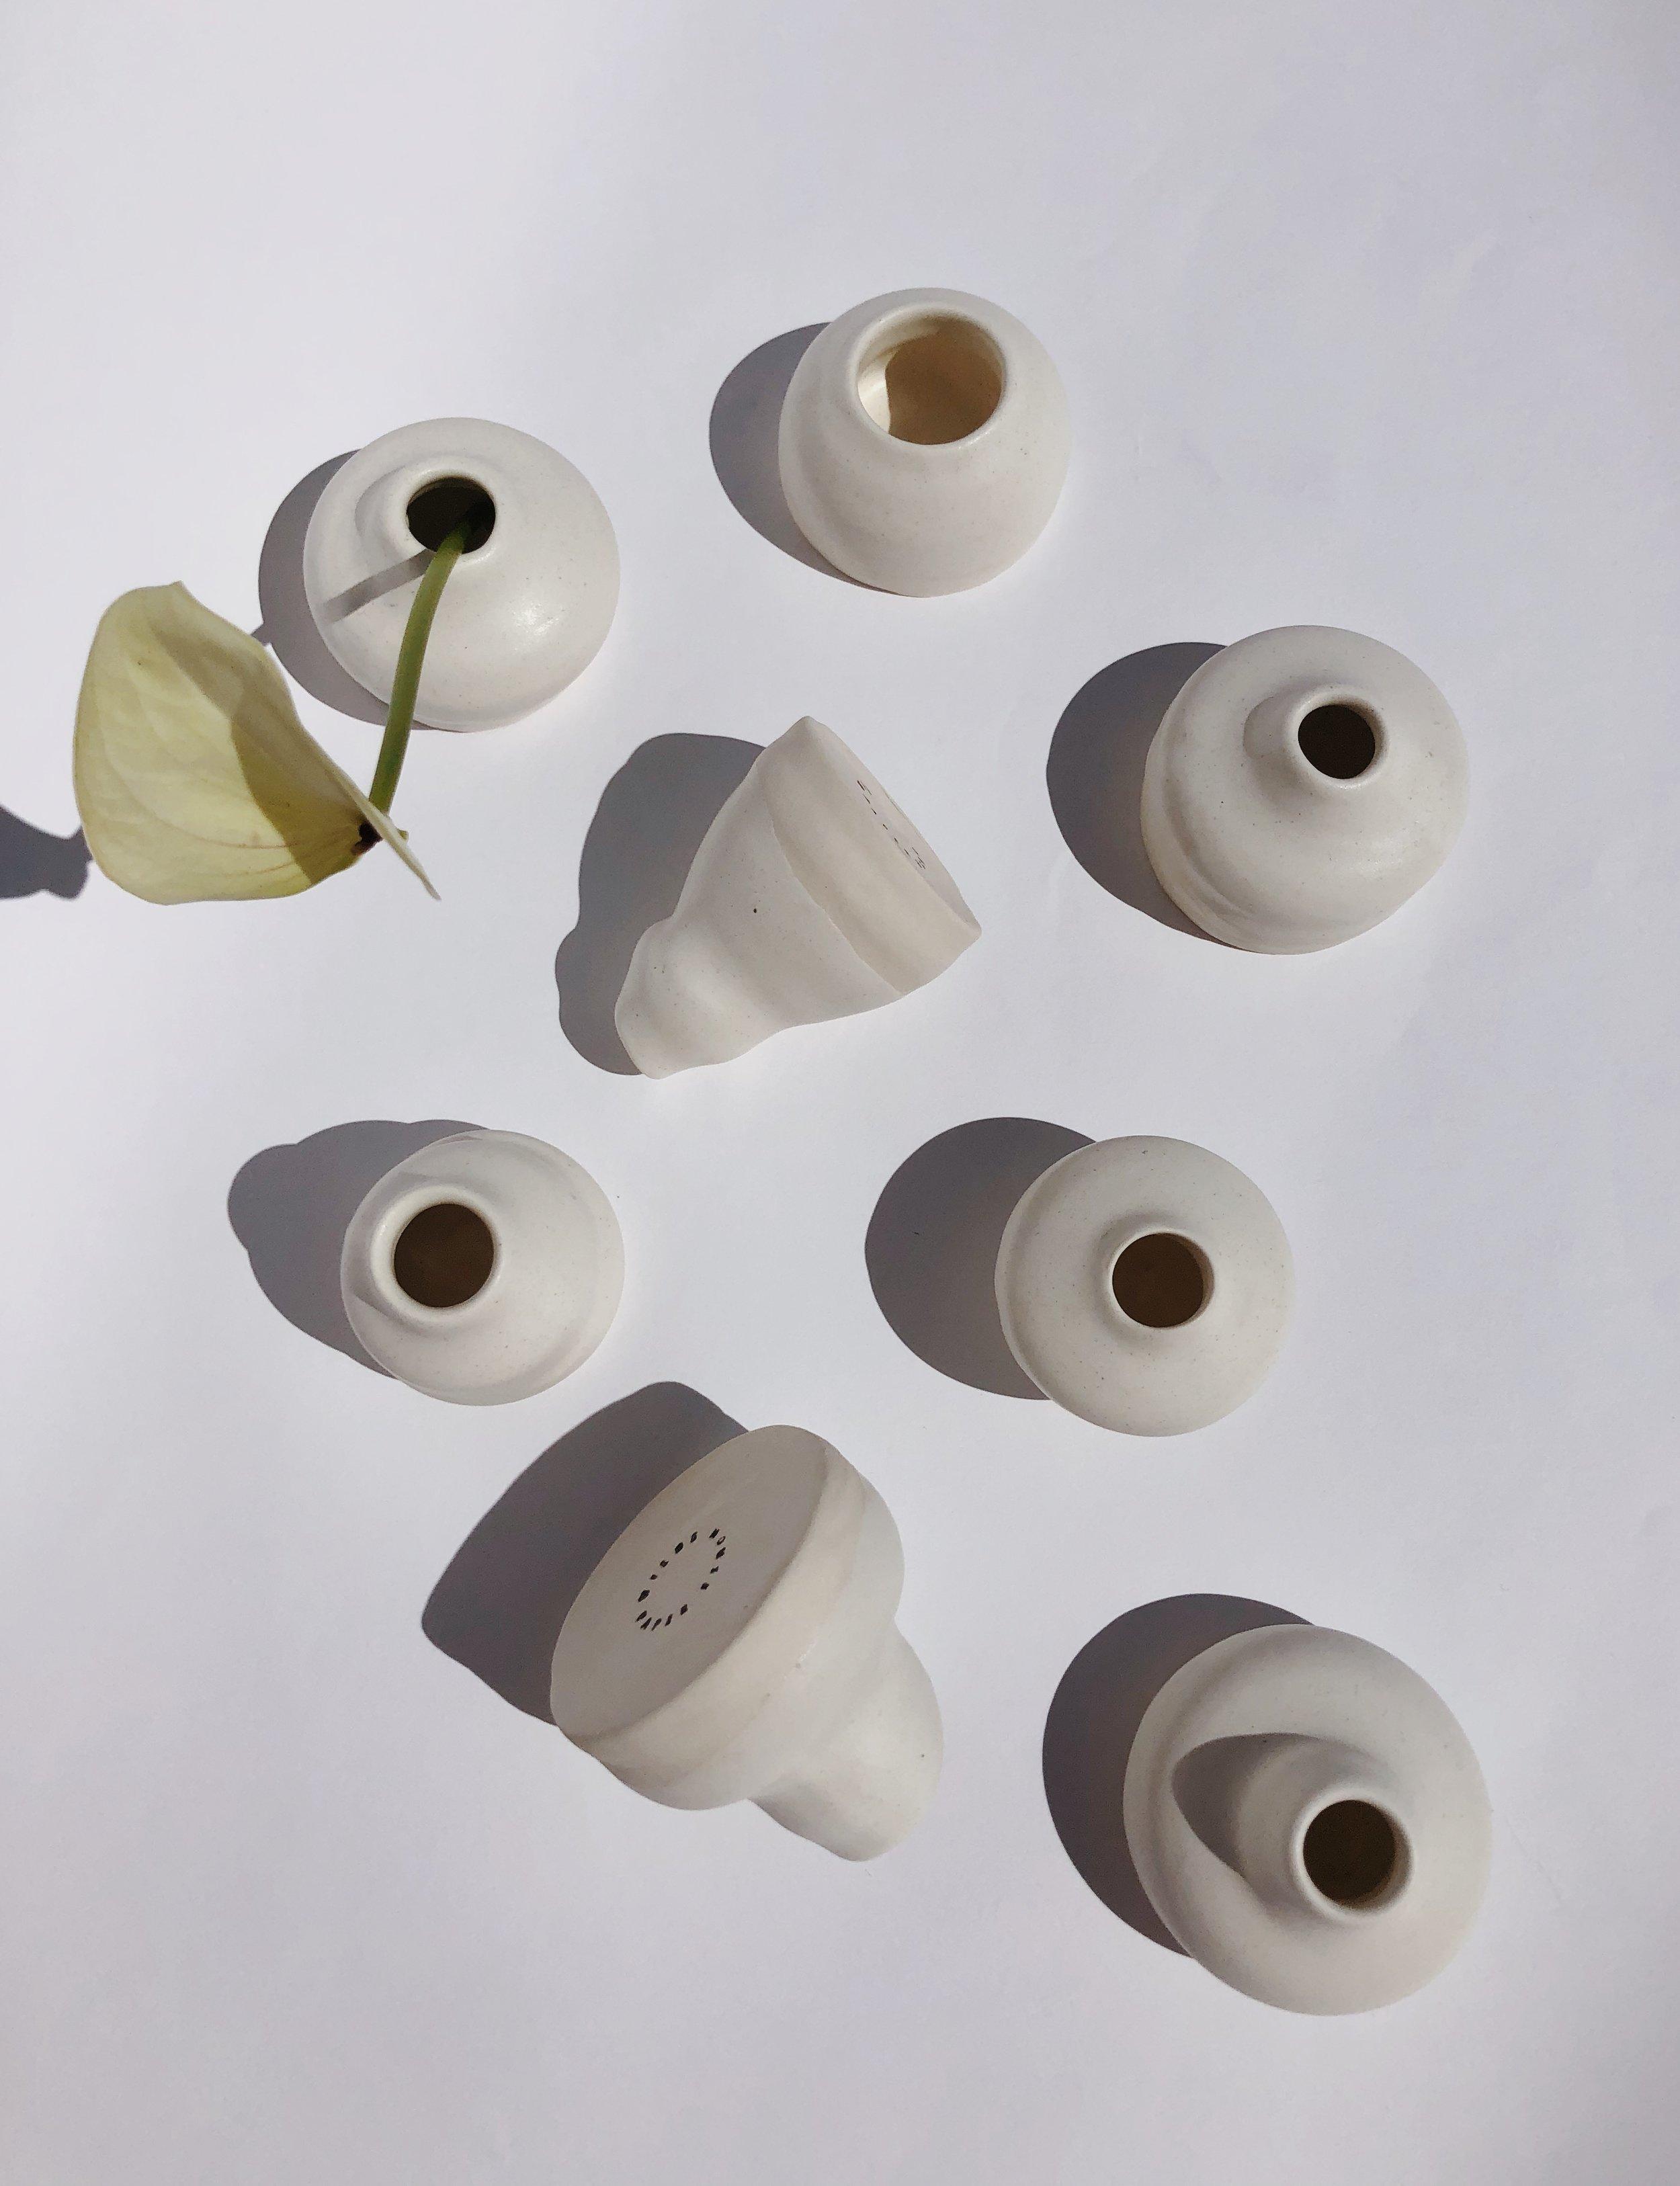 Exclusive Handmade Ceramic Bud Vase